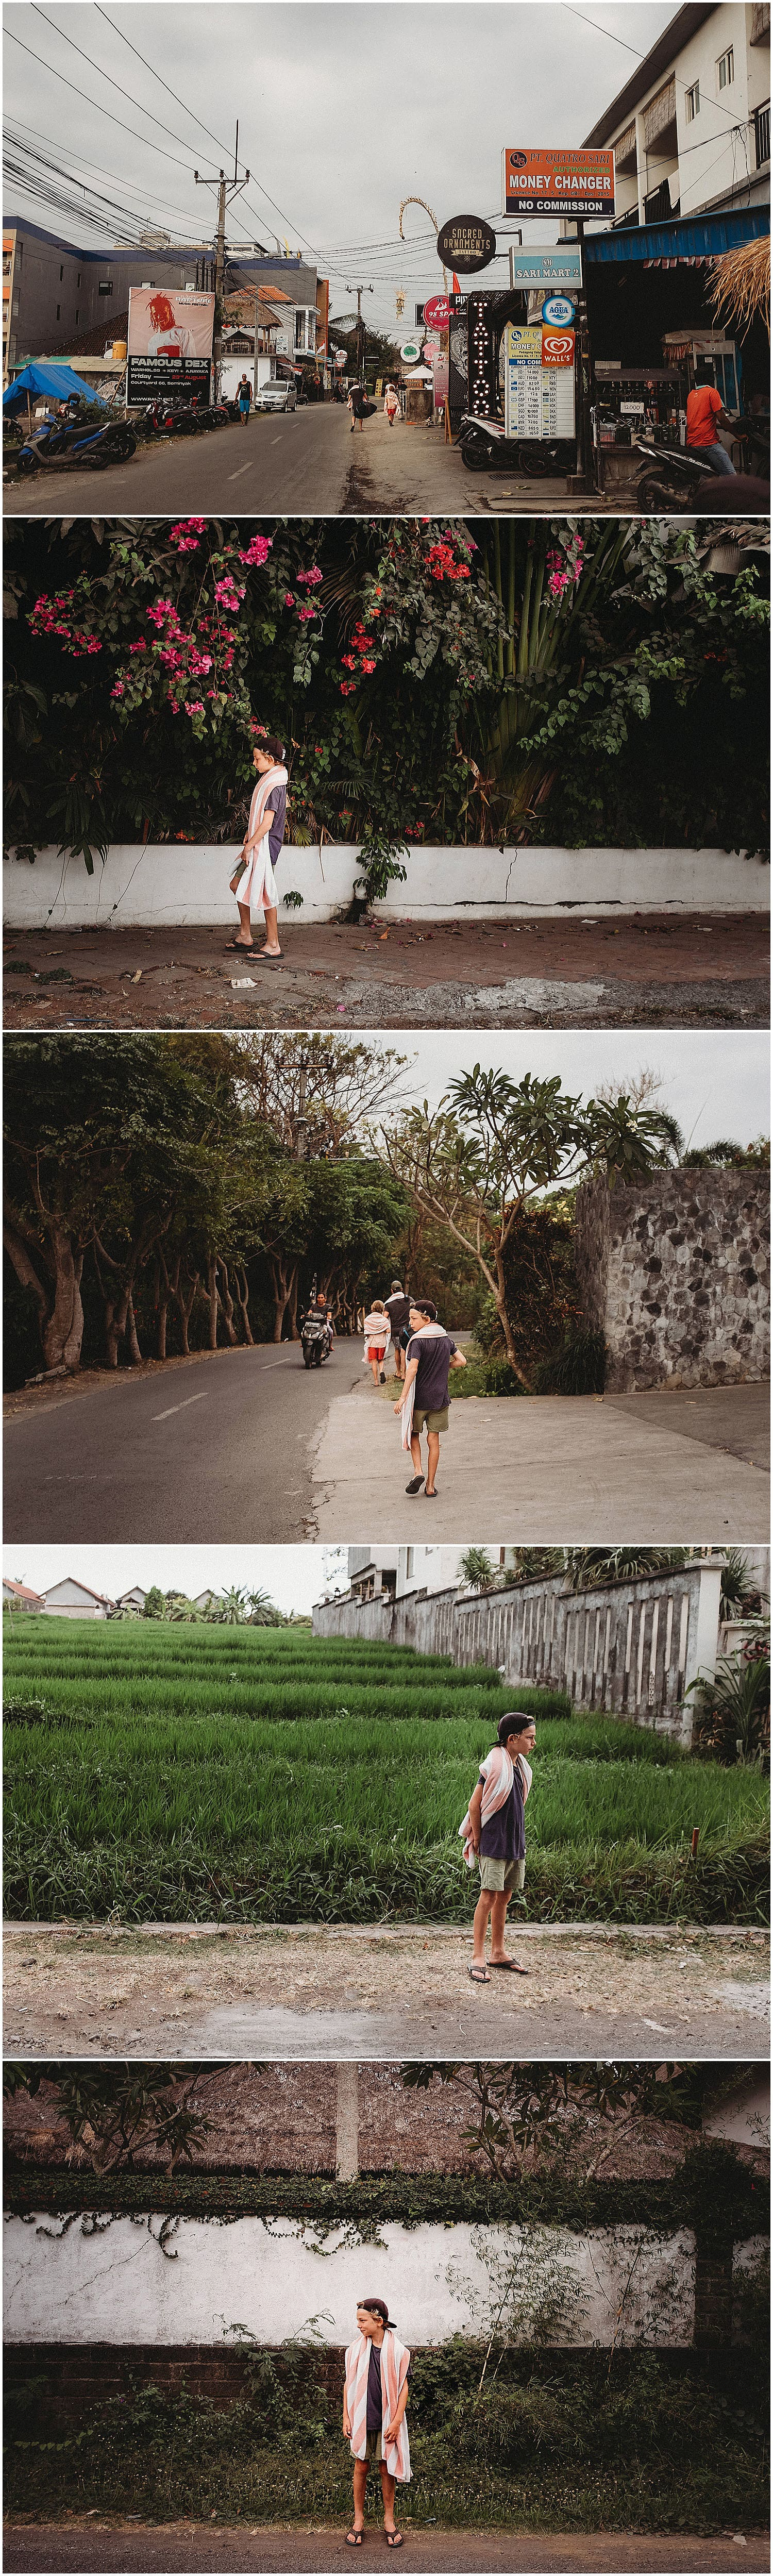 Bali-canggu-streets